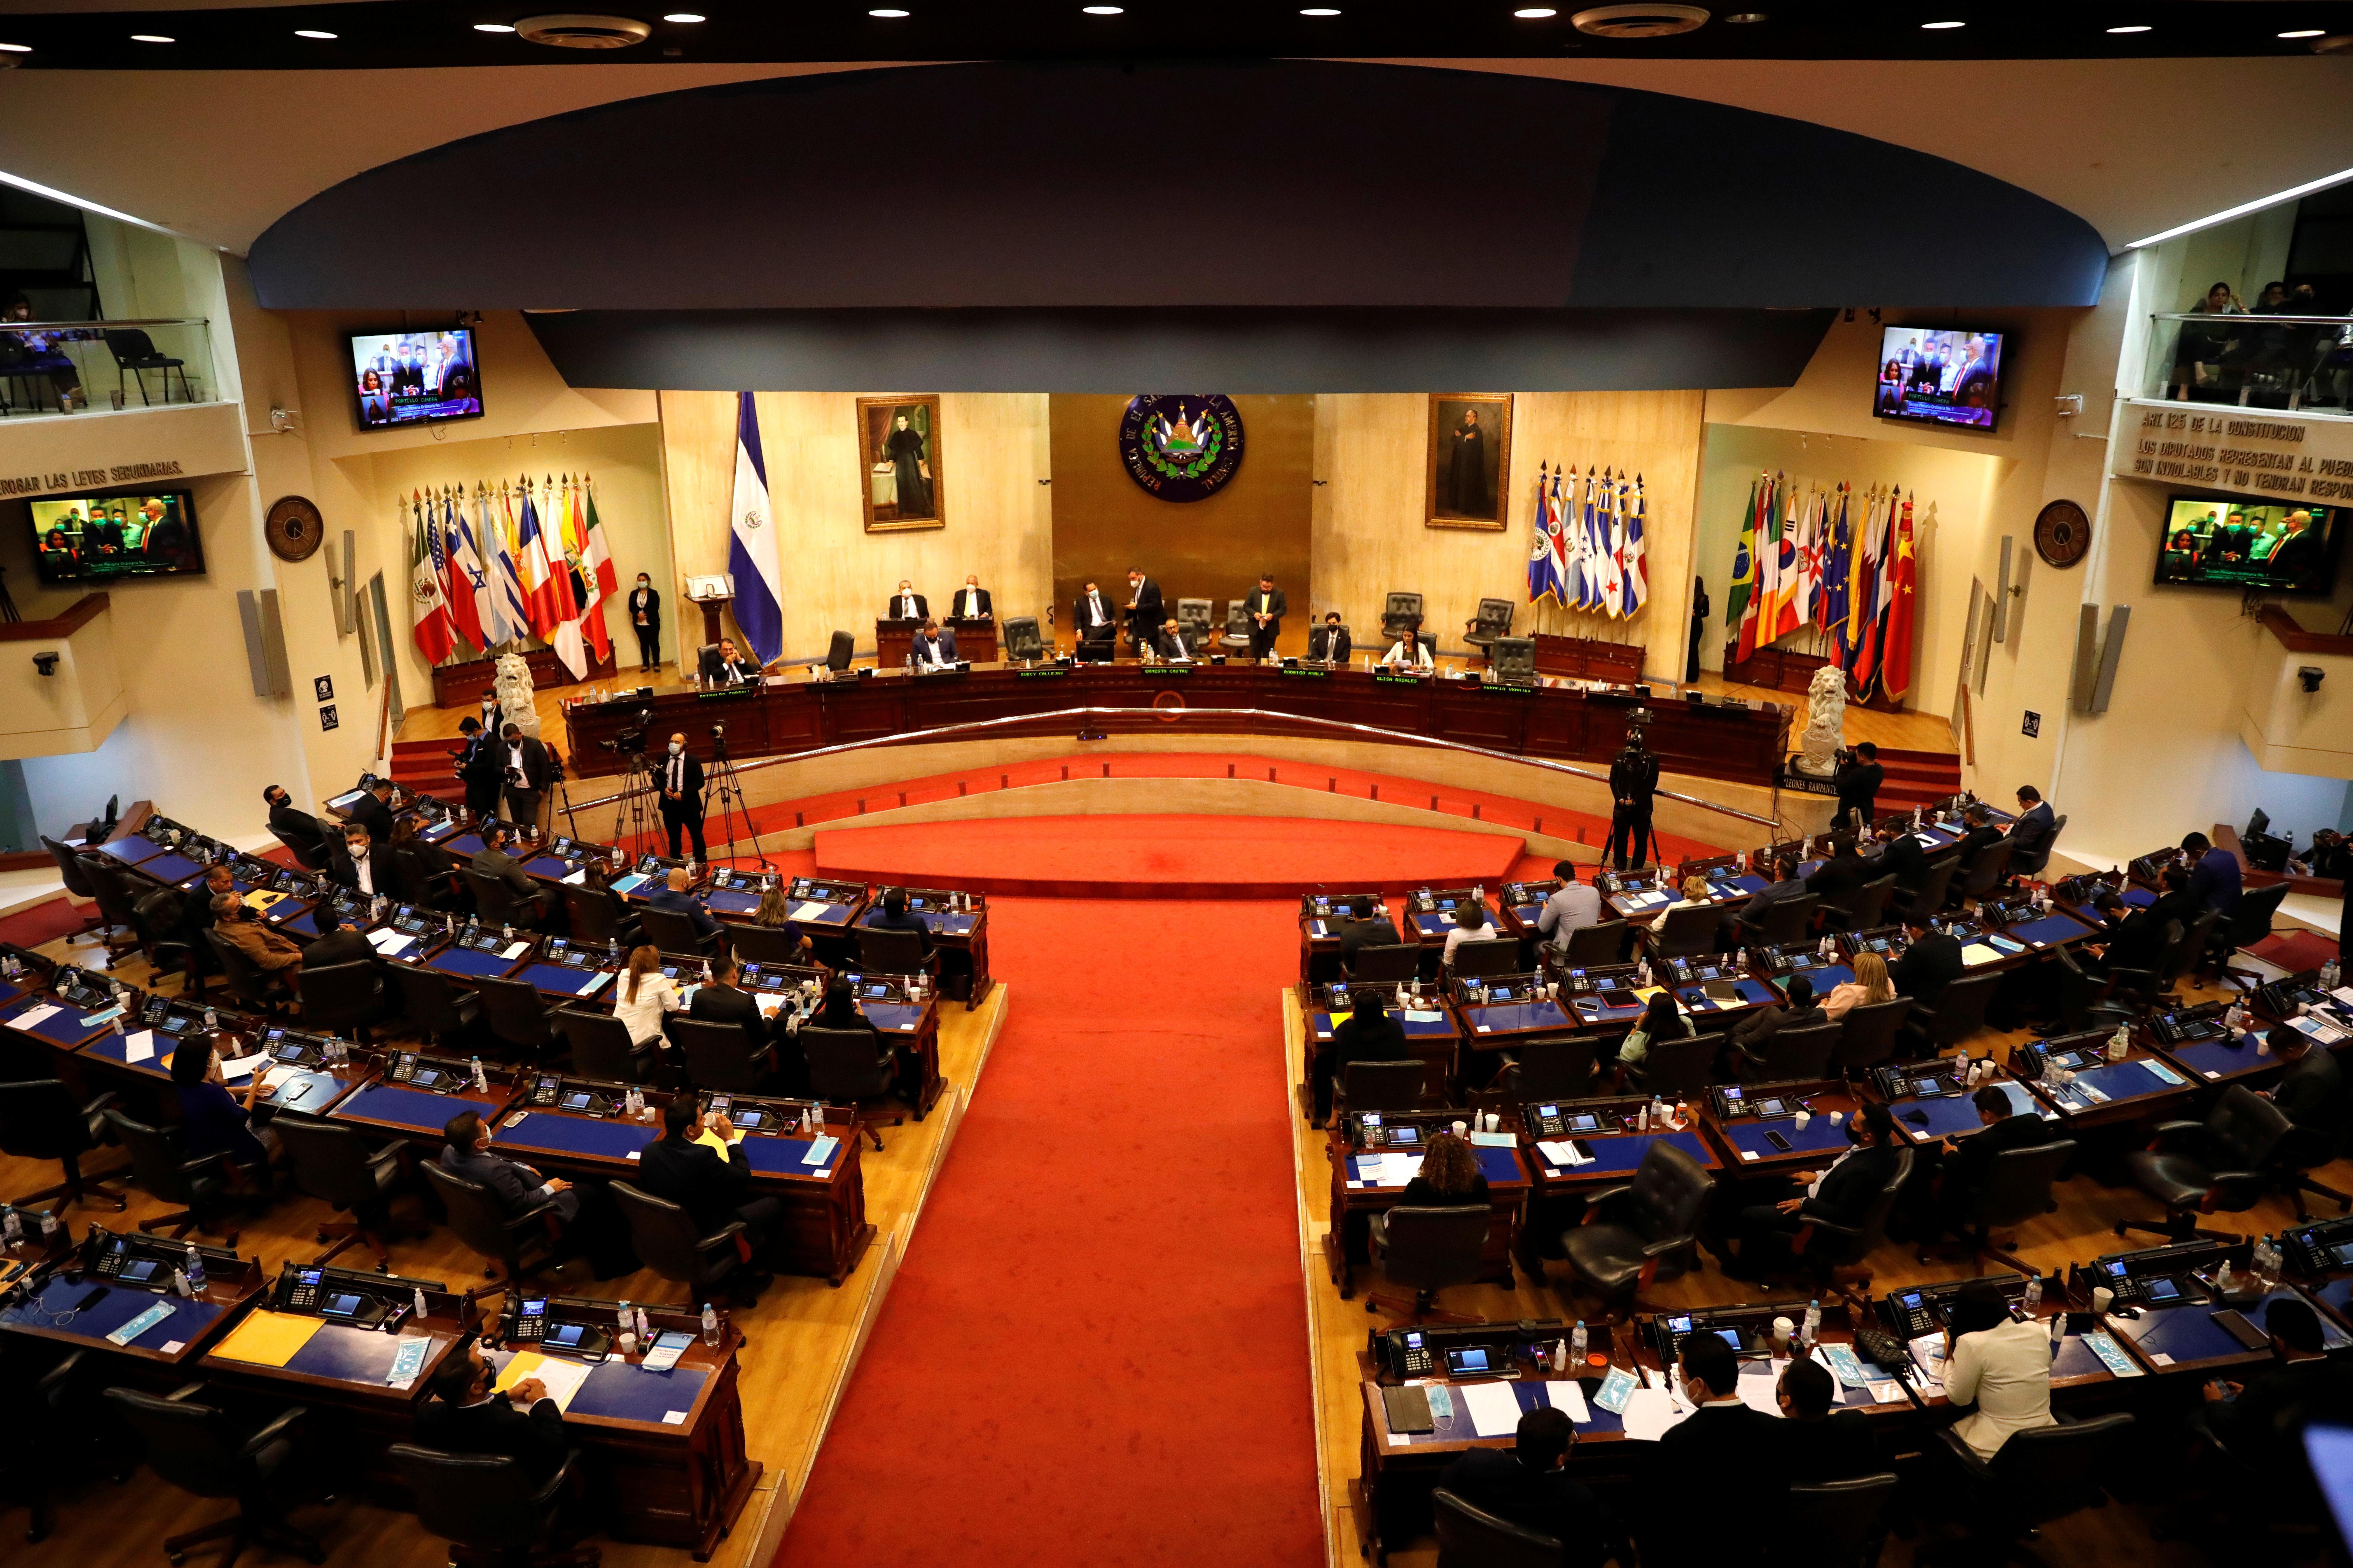 Representatives participate in a session to discuss the removal of Supreme Court judges at the Salvadoran congress, in San Salvador, El Salvador, May 1, 2021. REUTERS/Jose Cabezas